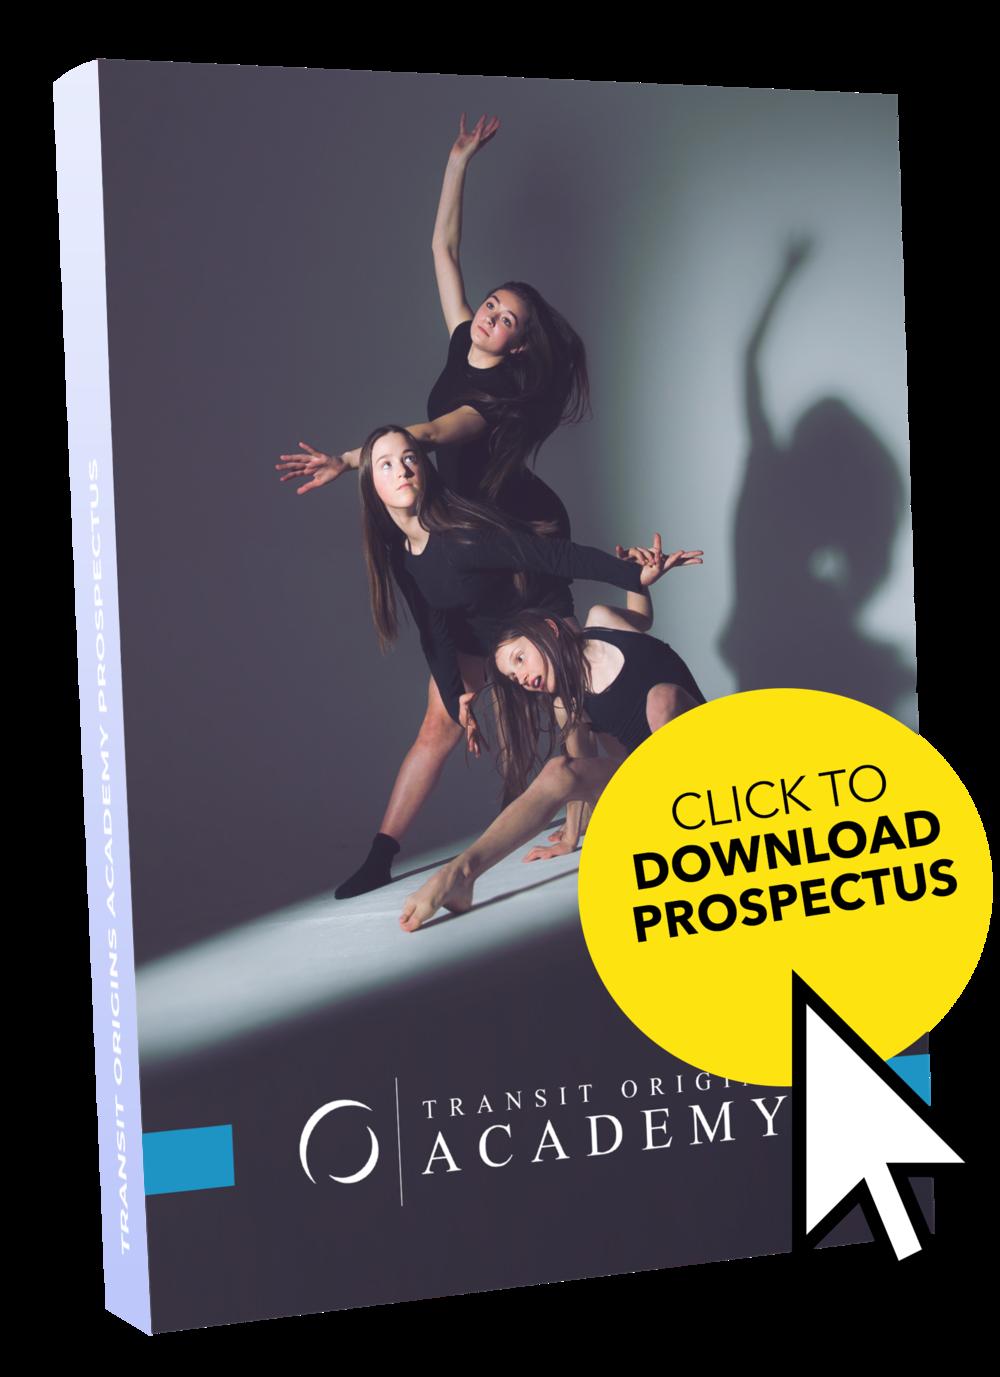 prospectus download 2.png